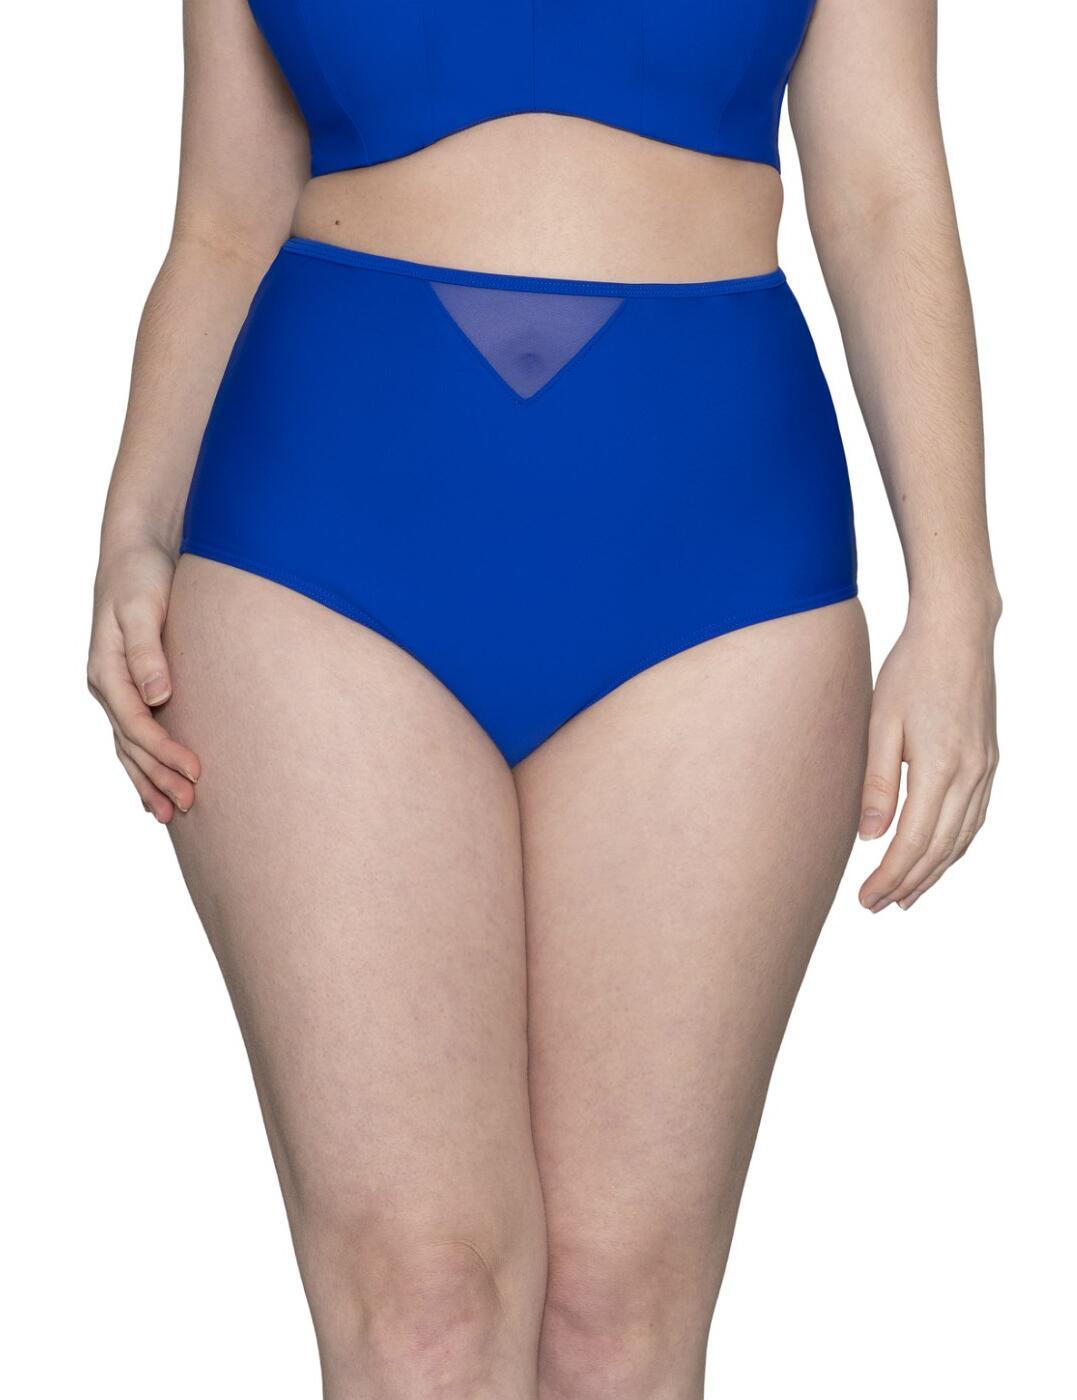 CS001505 Curvy Kate Sheer Class High Waist Bikini Brief - CS001505 Cobalt